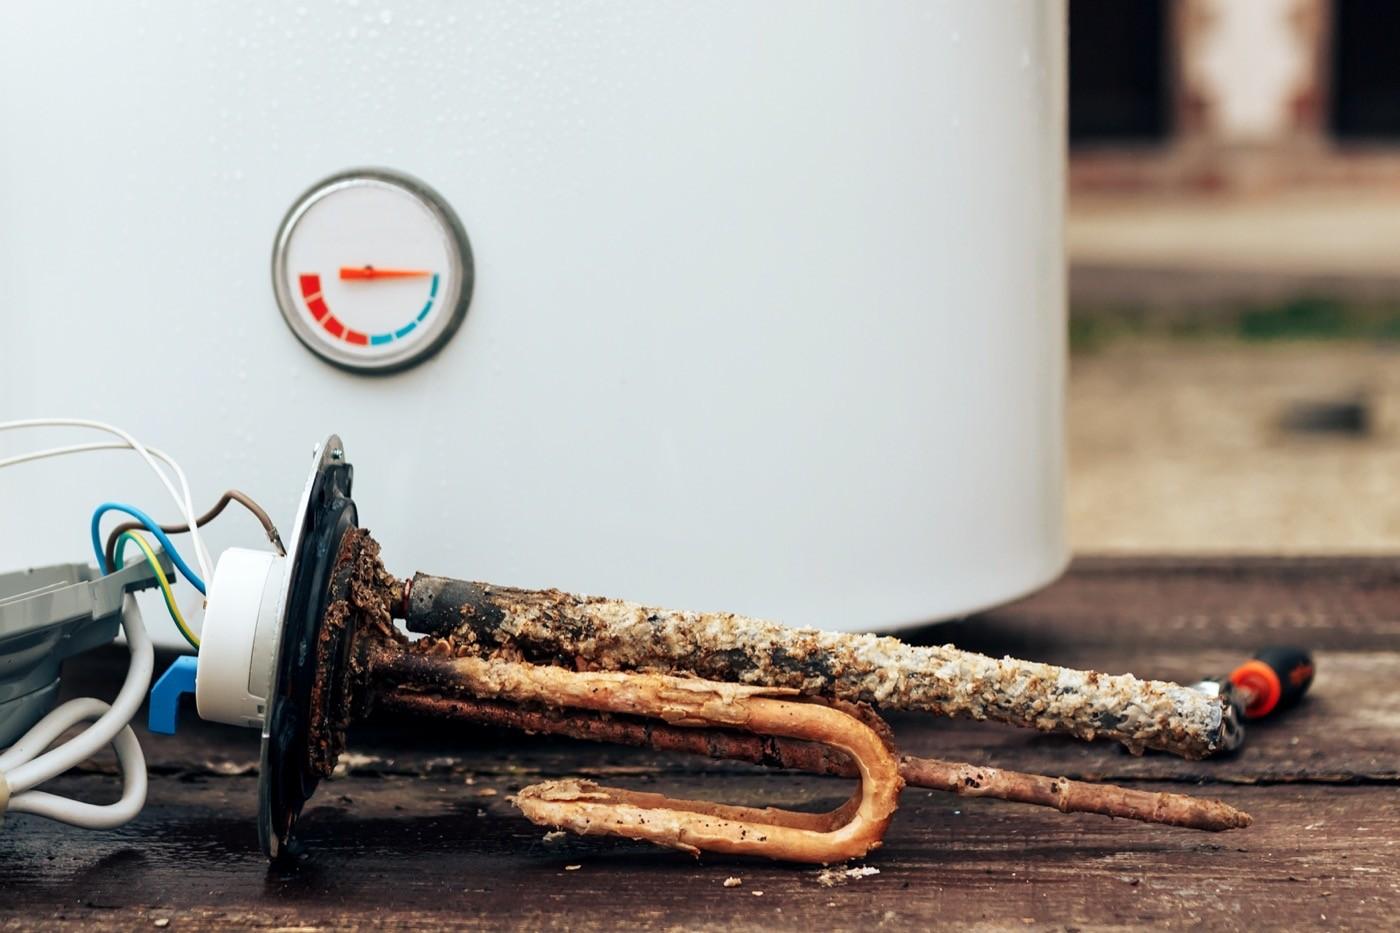 Hire Water Heater Repairs Experts